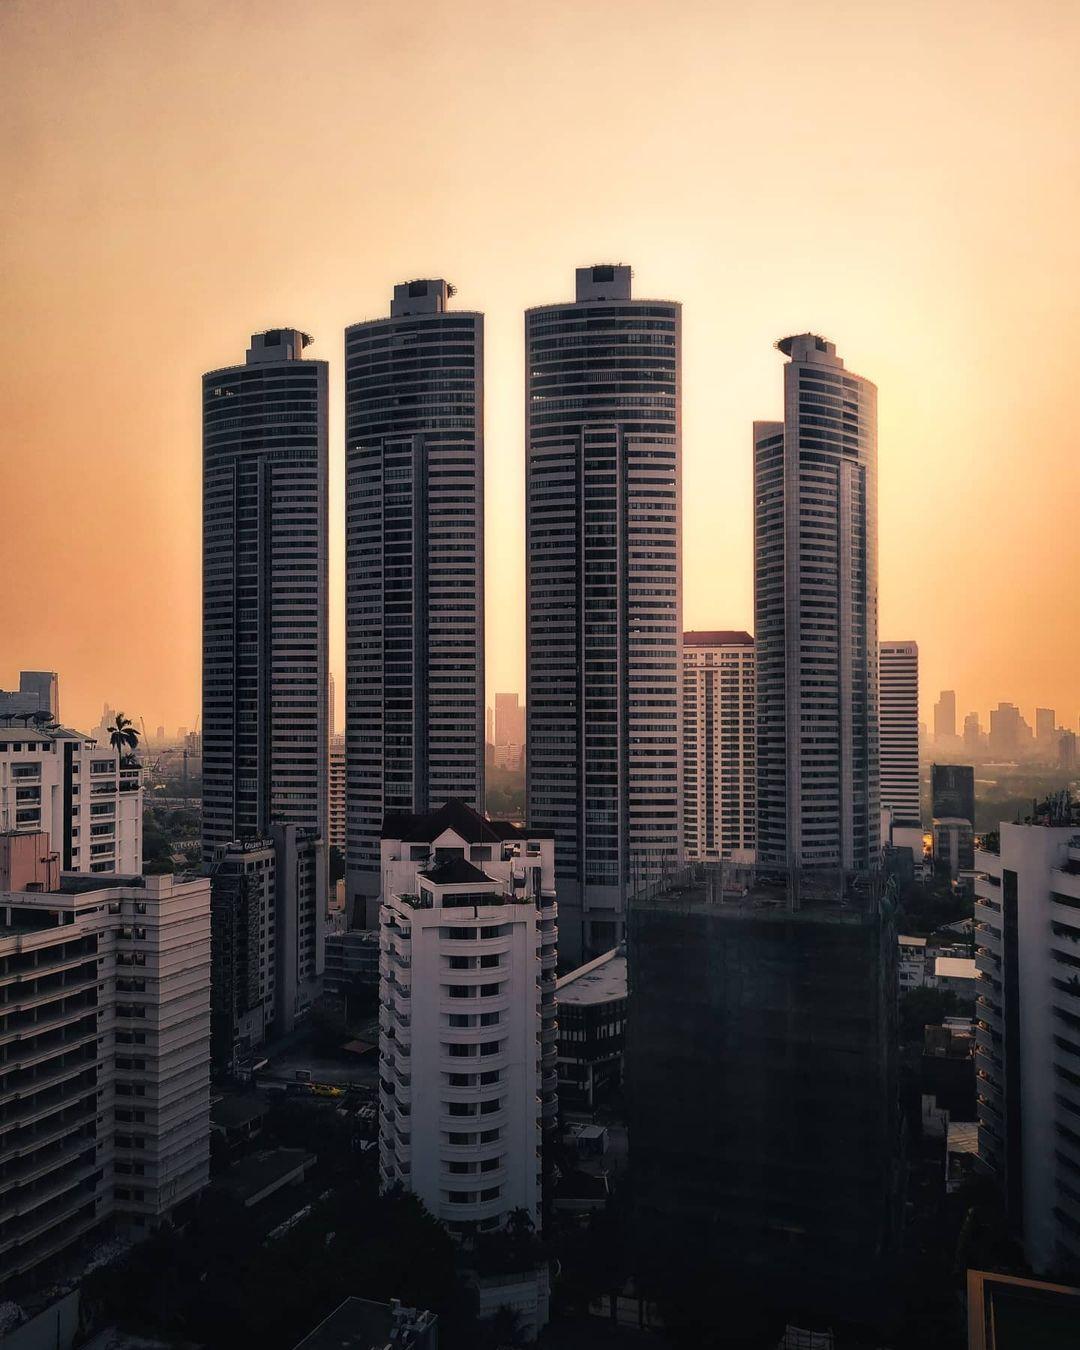 Городские и уличные снимки Бангкока от Наттачата Вахираваракарна